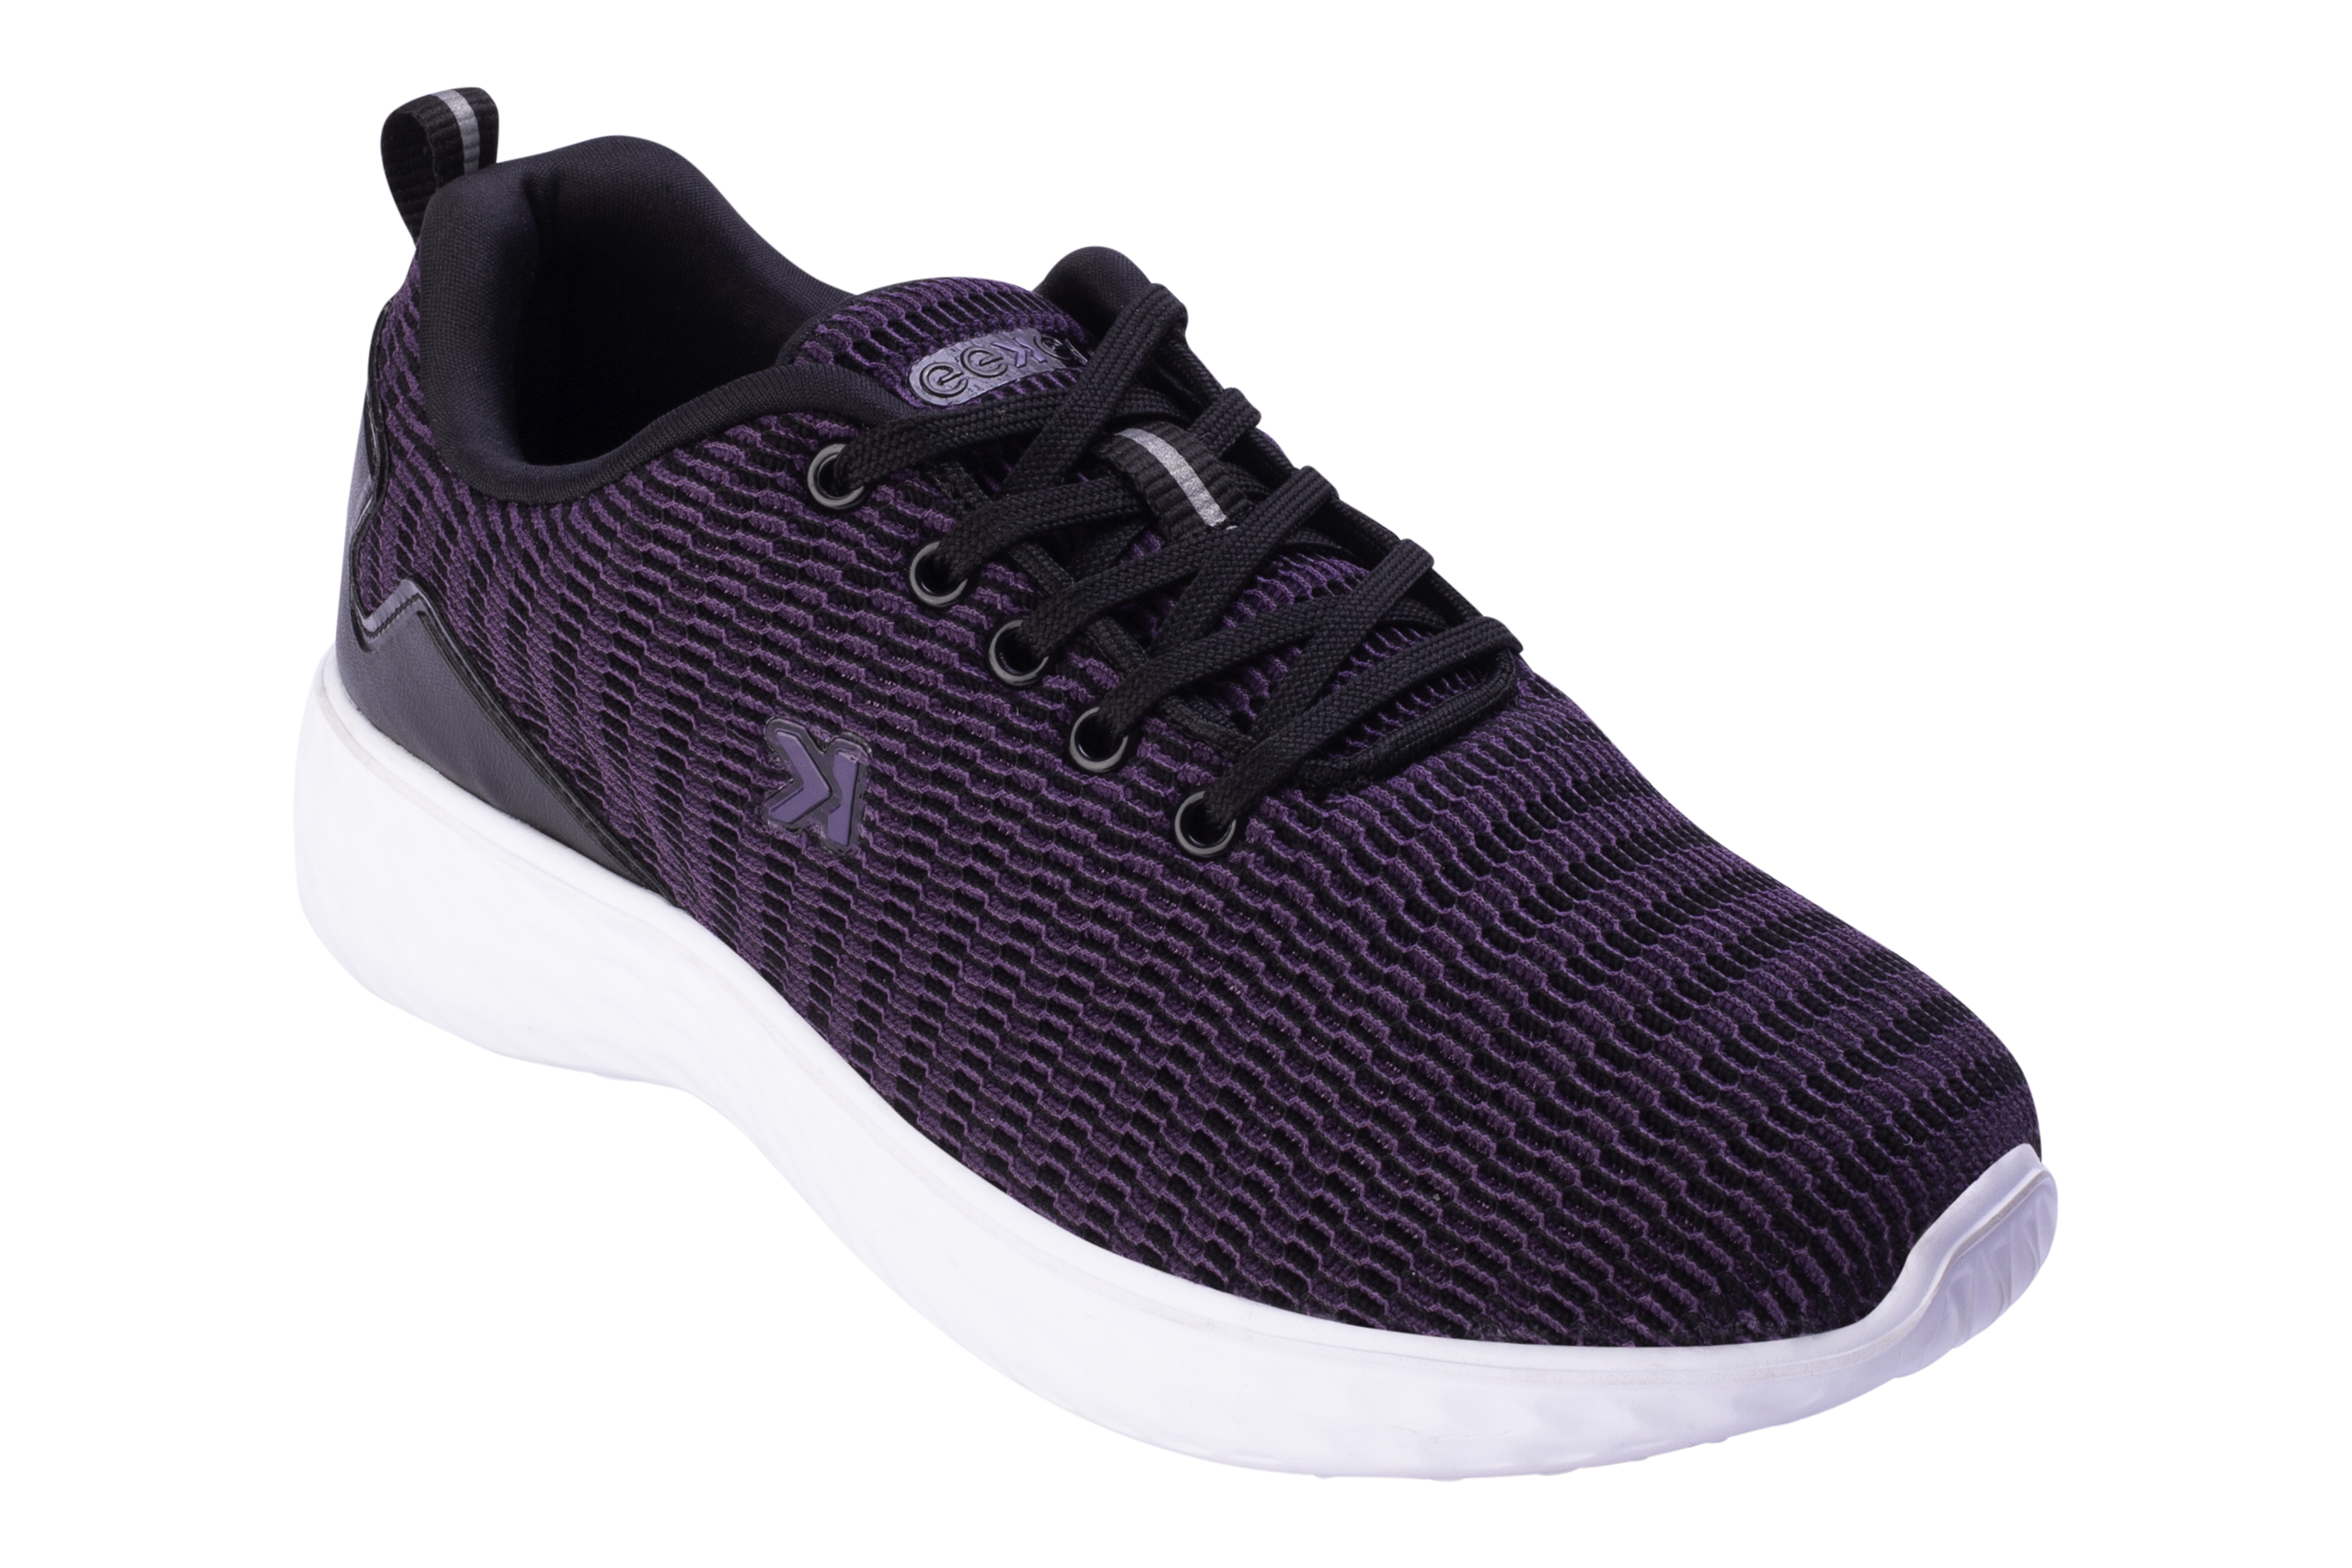 EEKEN | EEKEN PURPLE Athleisure Lightweight Casual Shoes for Women